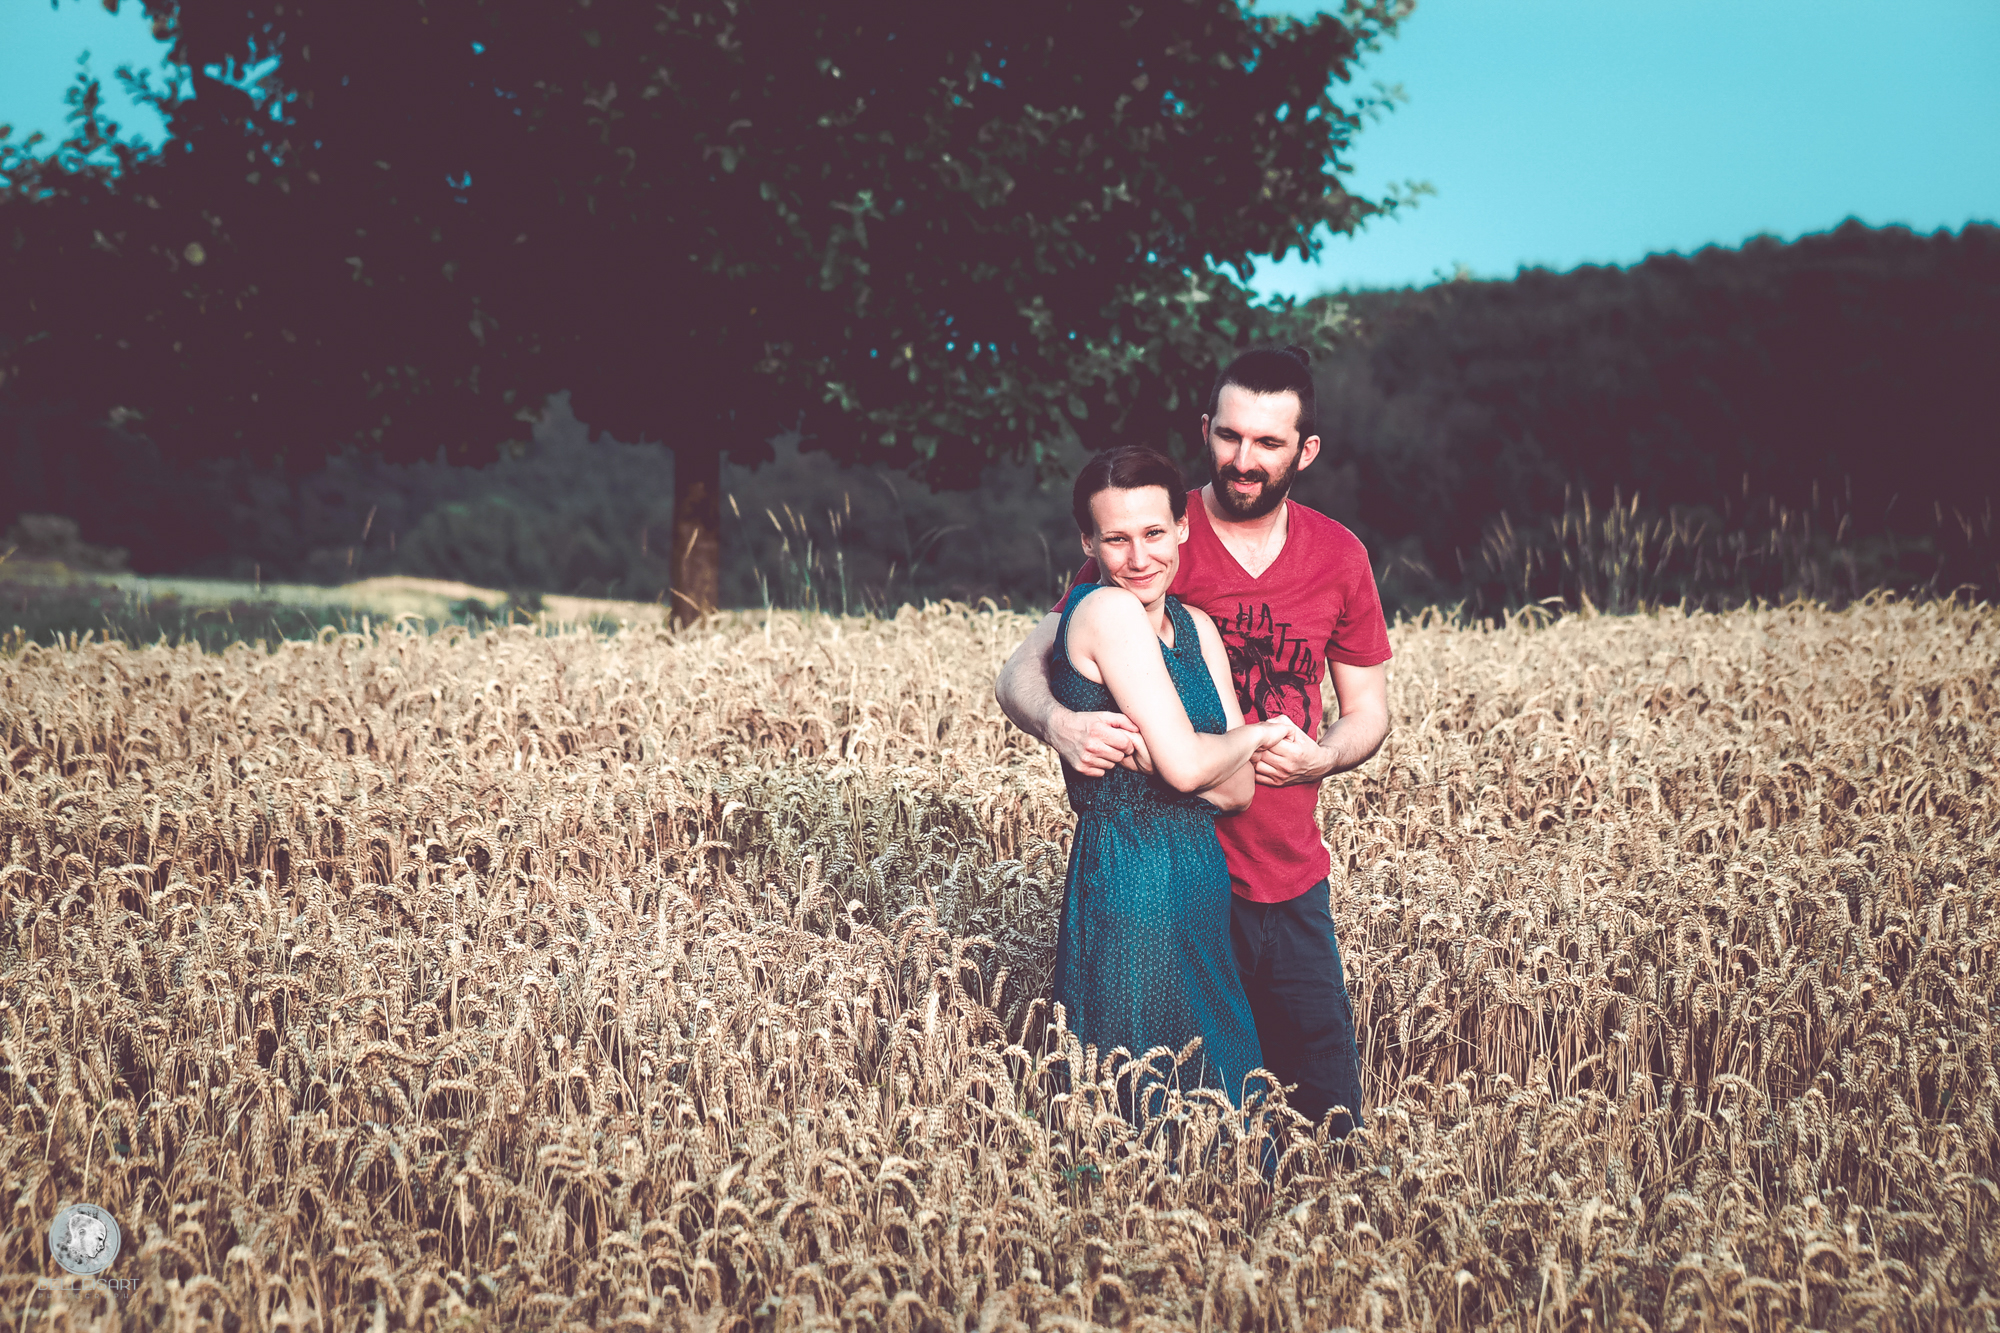 Jenni & Mike | ©belleisart.com